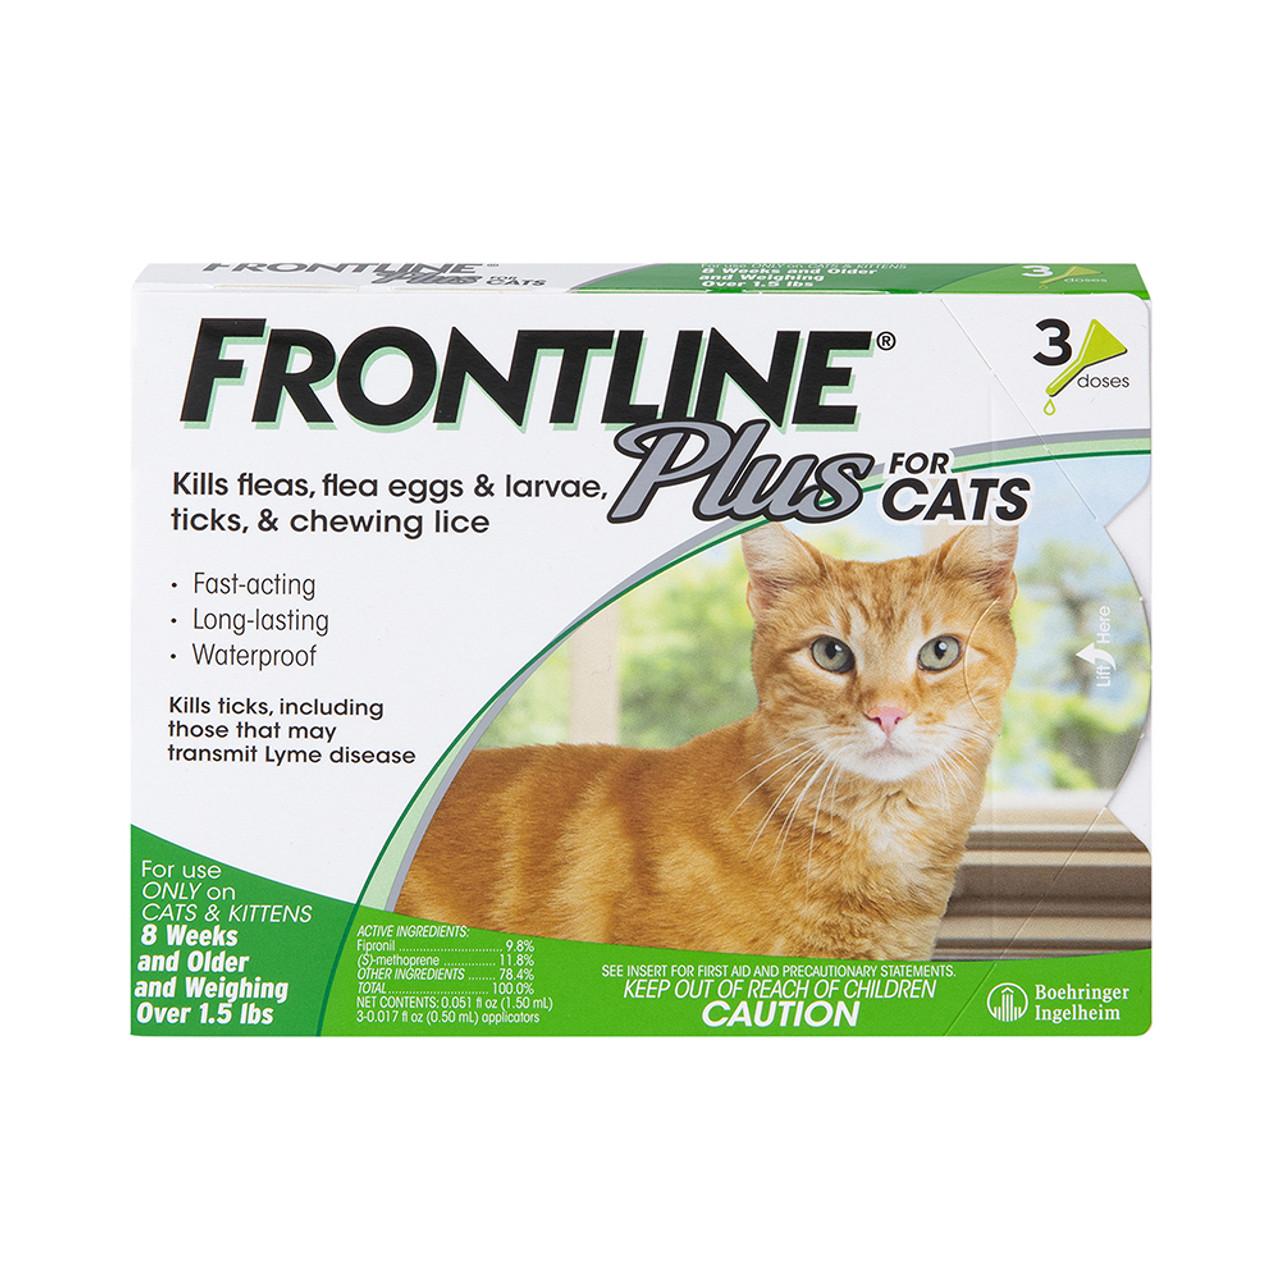 Frontline Plus Flea & Tick Treatment for Cats & Kittens - Front